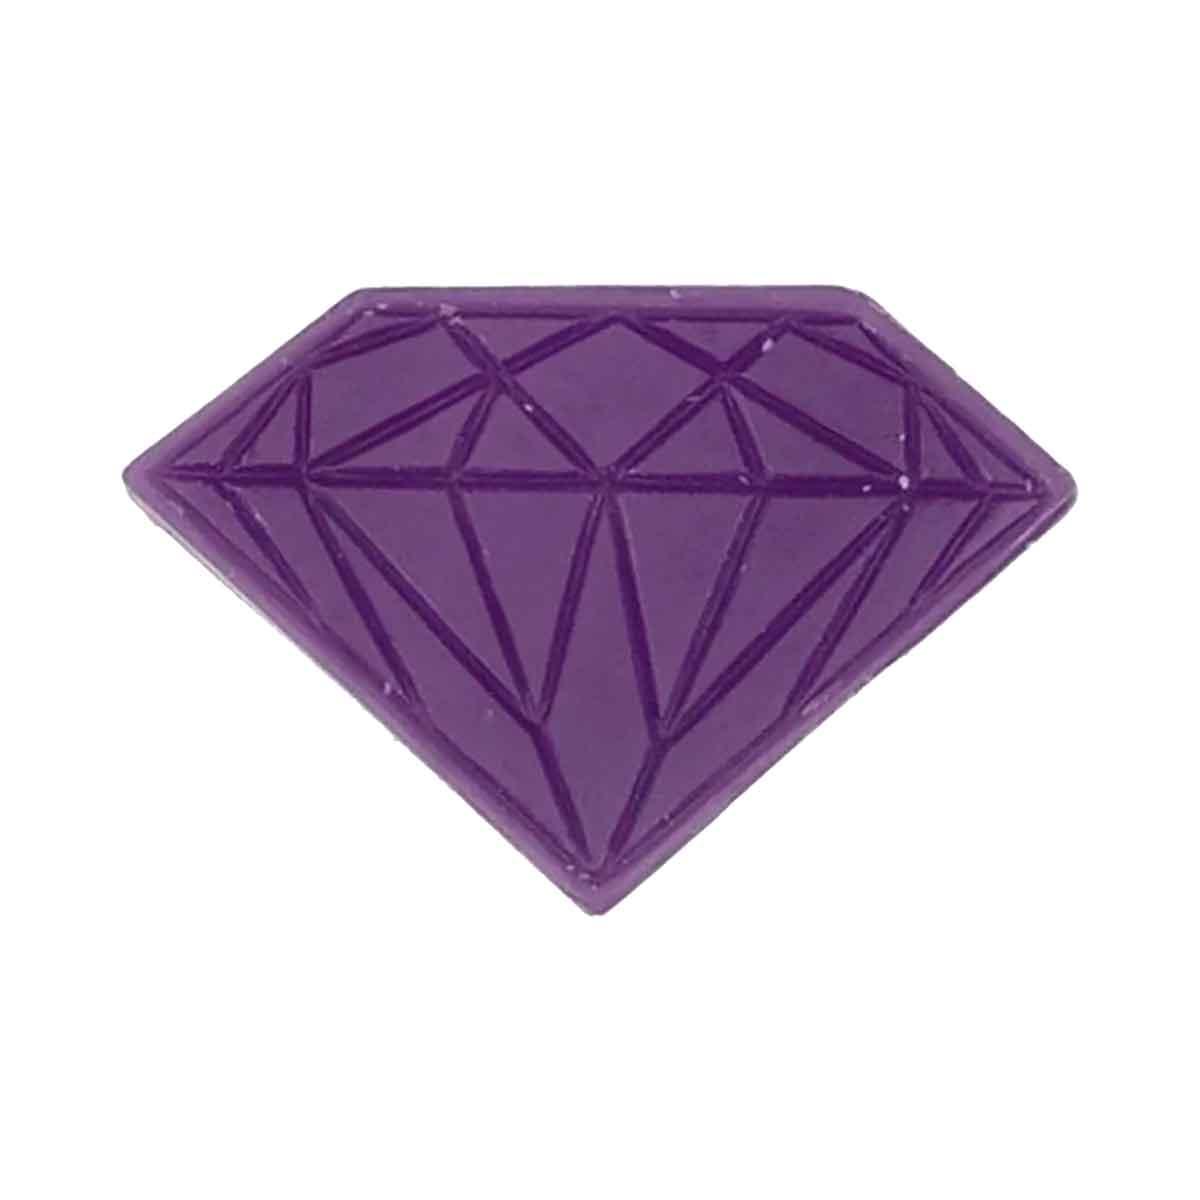 Hella Slick Purple Skate Wax Diamond Supply Co